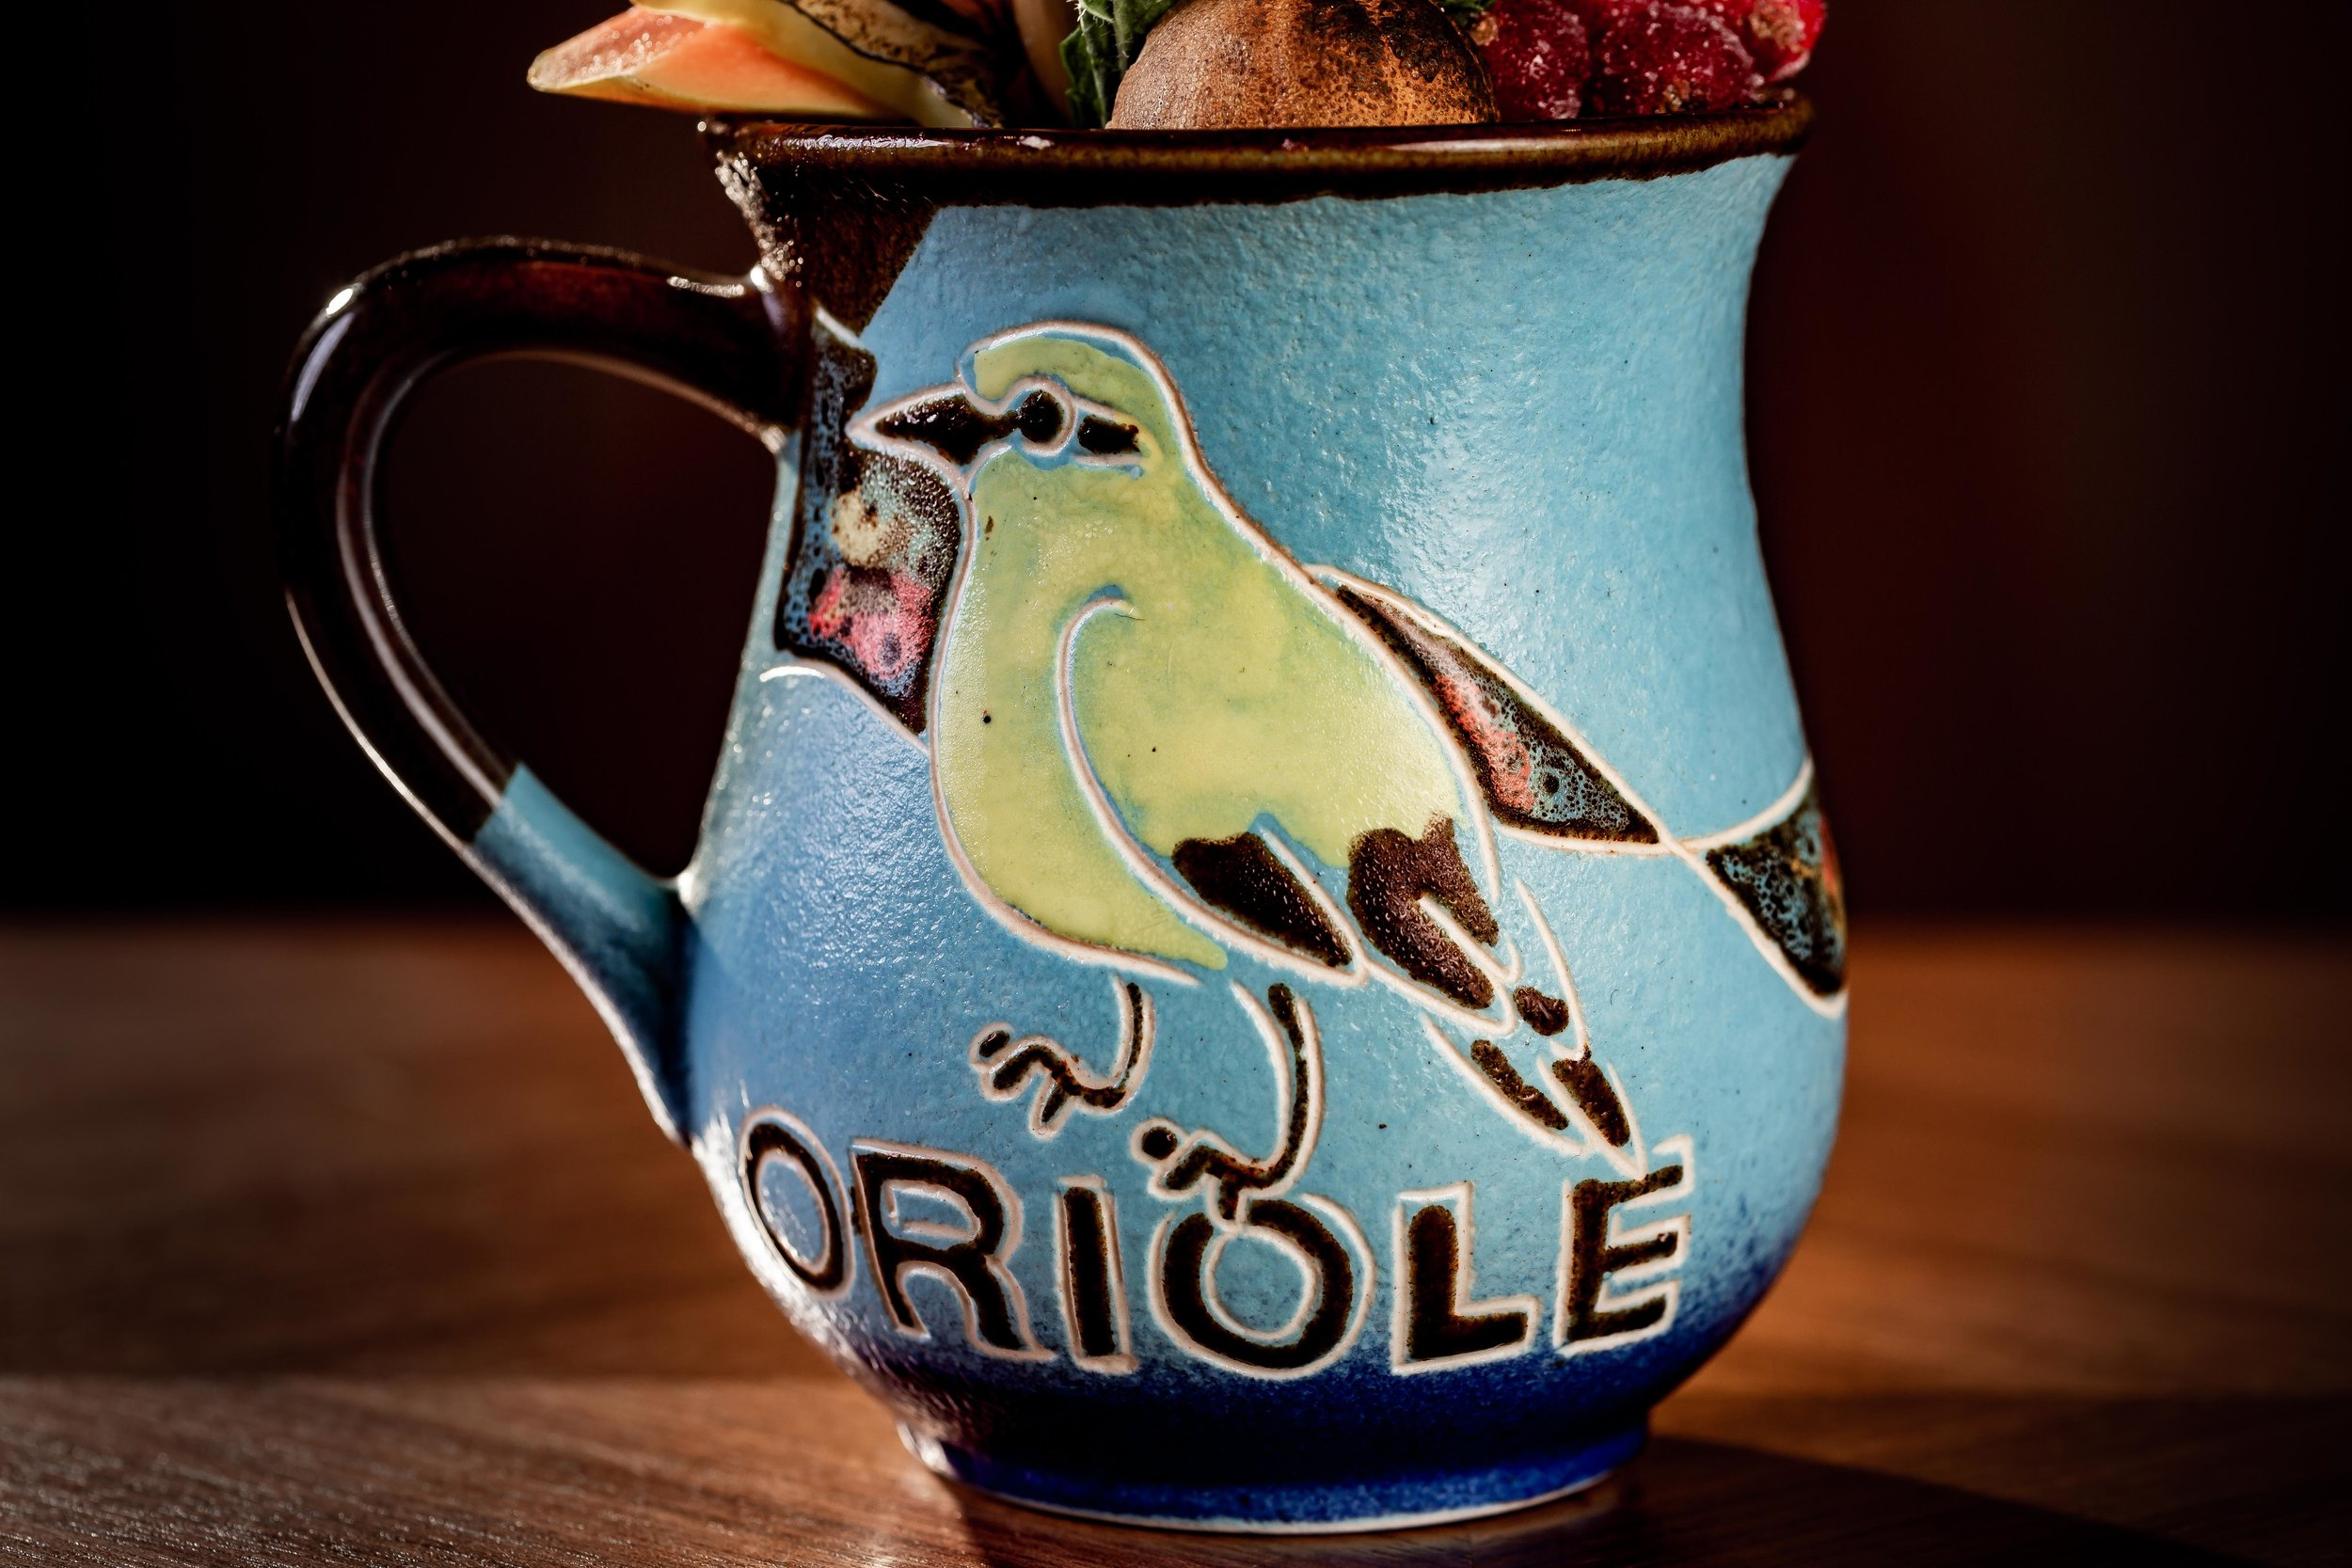 Oriole 2019 menu 267.jpg